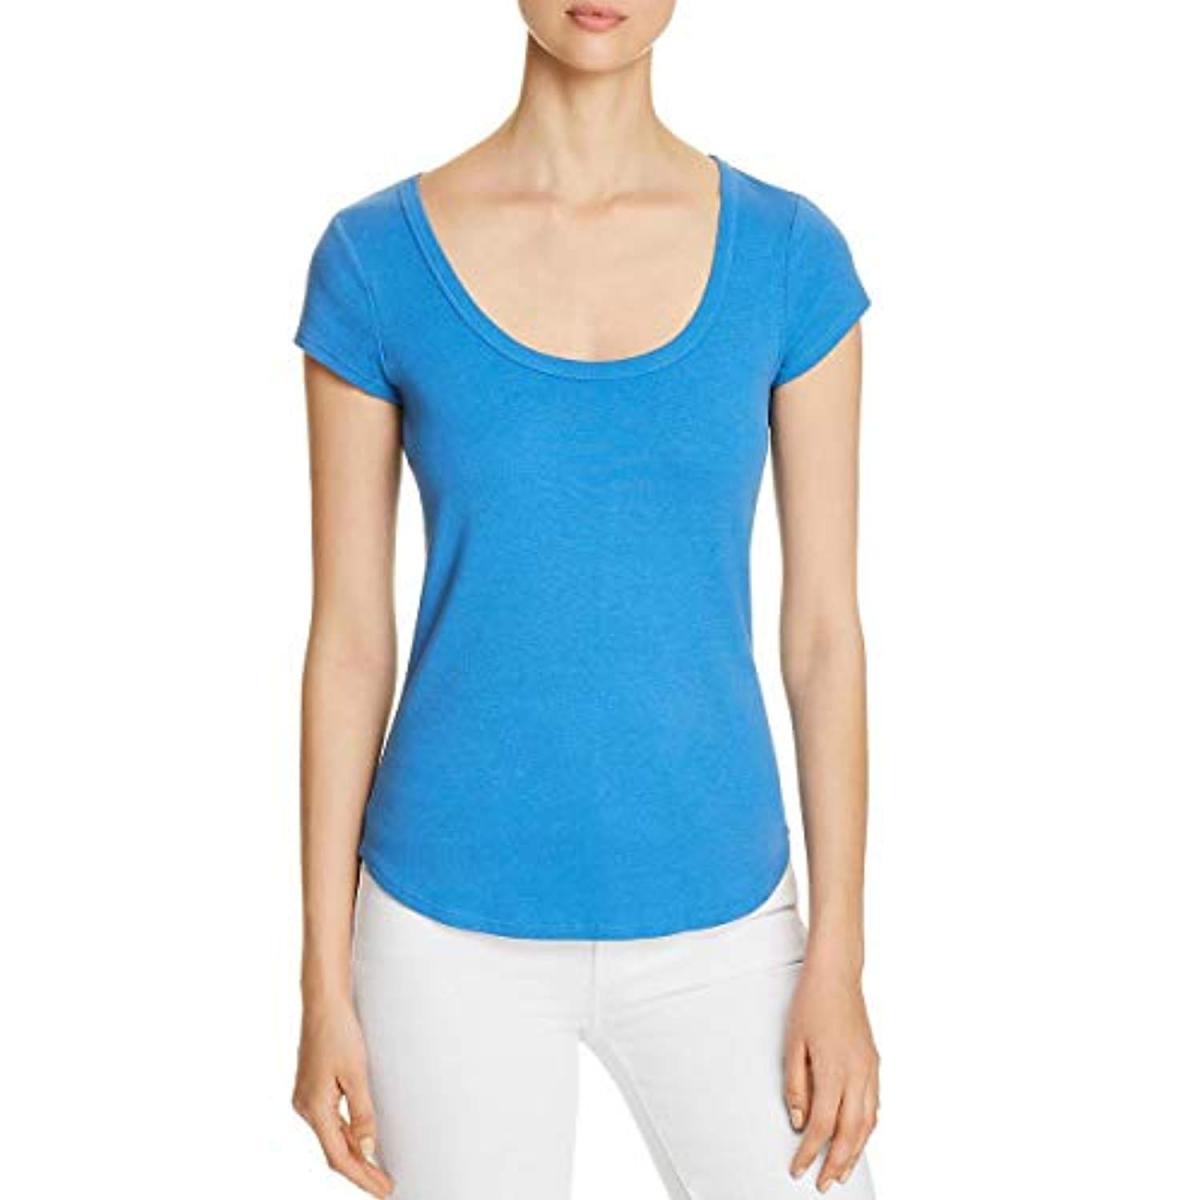 Juniors Aeropostale Womens Solid Basic T-Shirt 119 XS